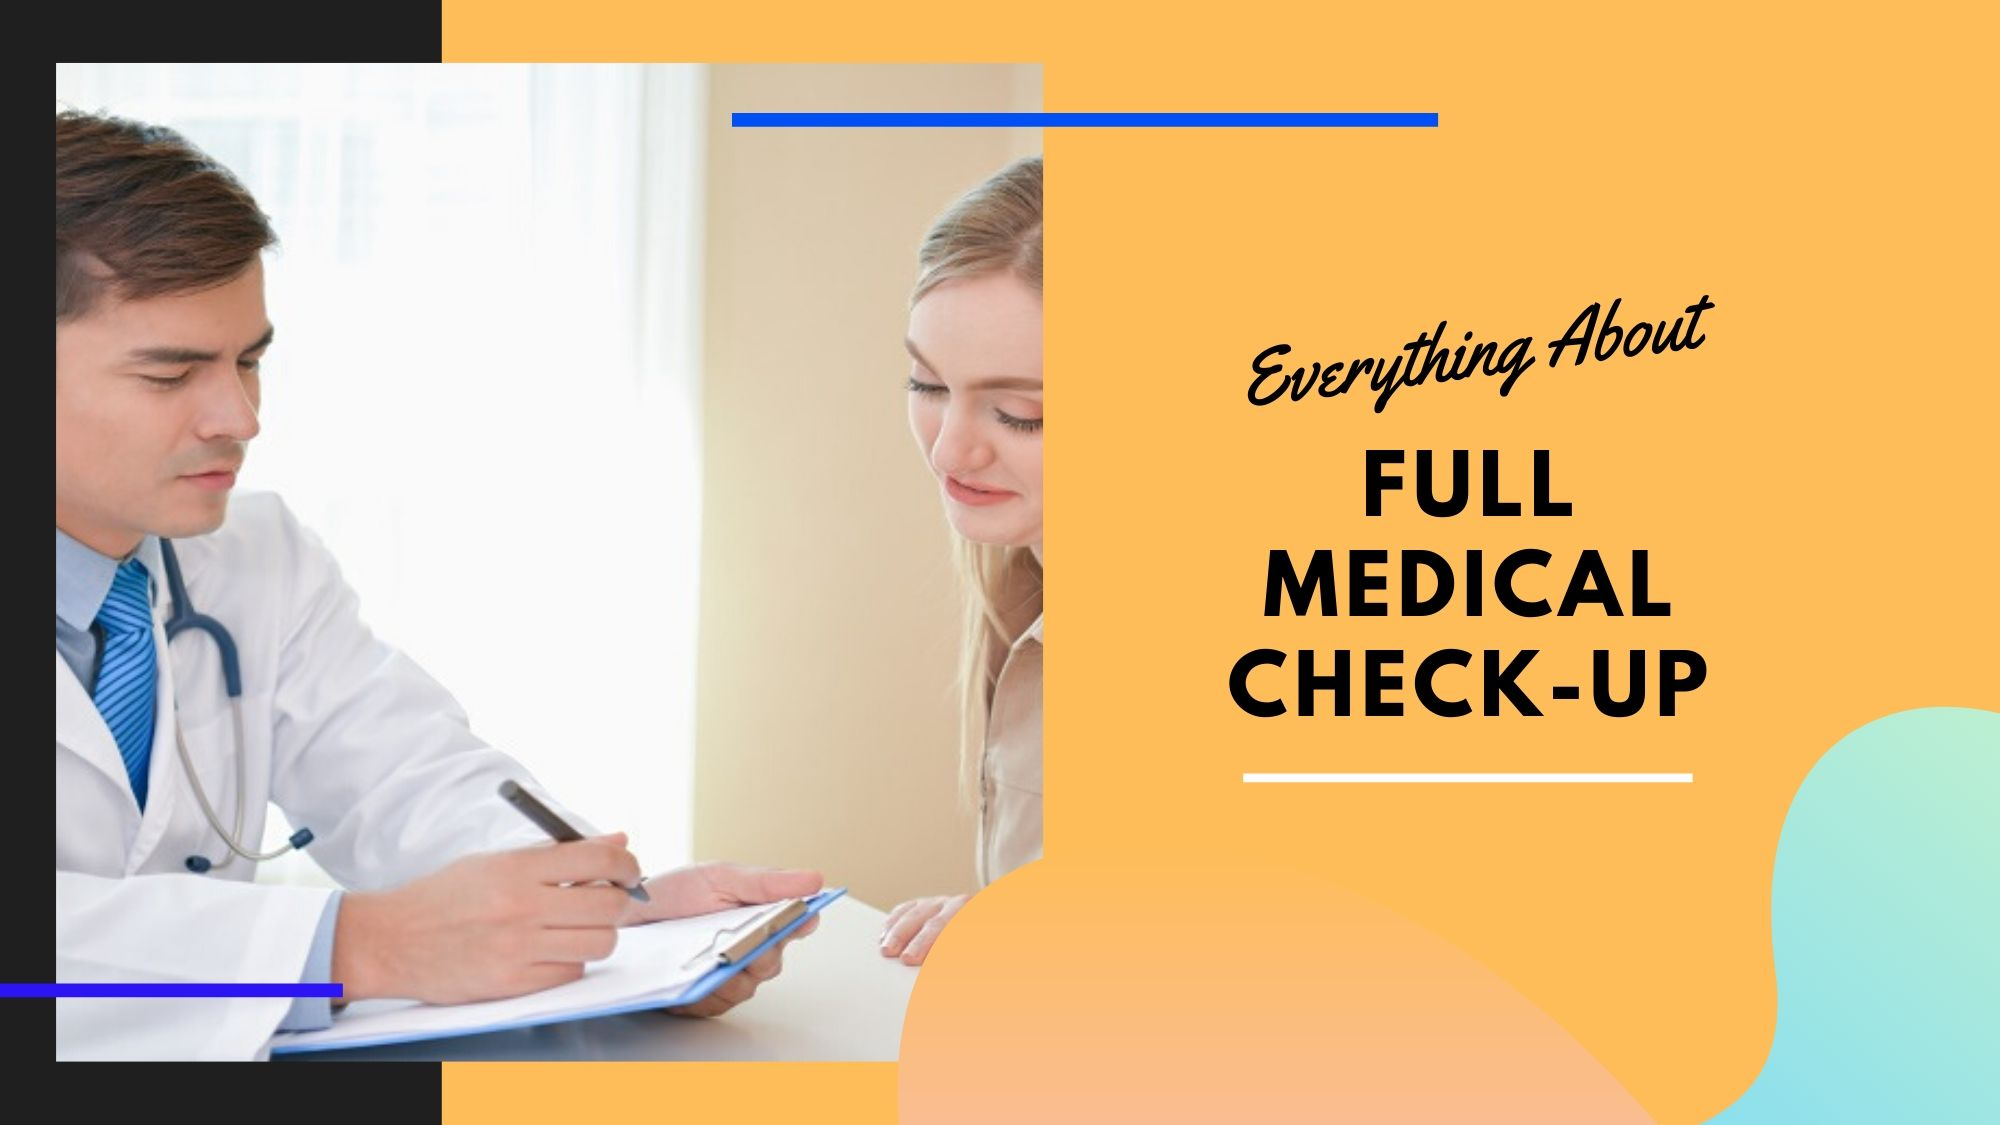 Full Medical Check Up